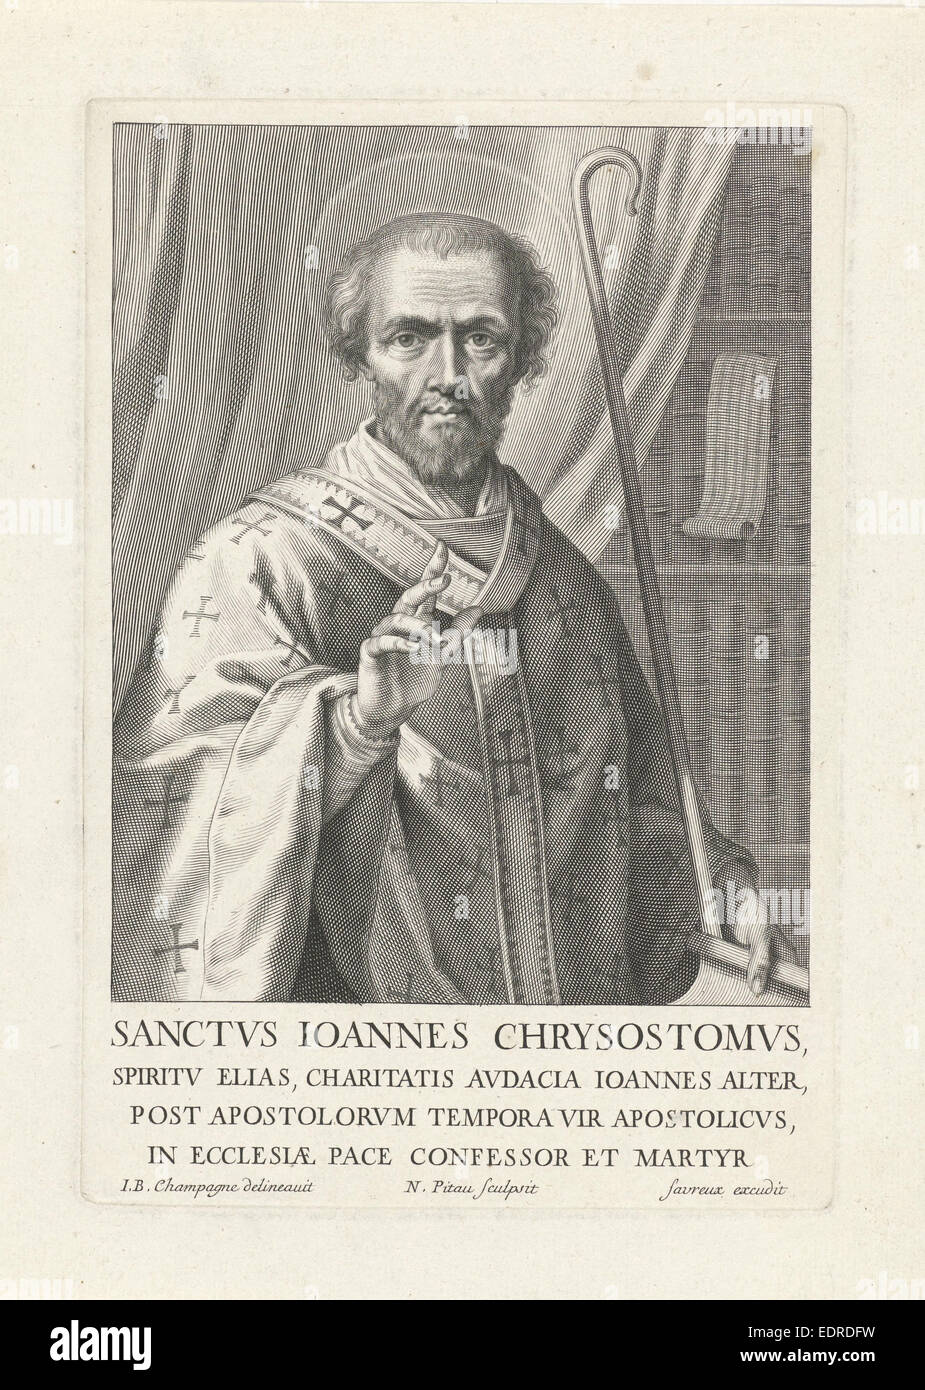 portrait-of-st-john-chrysostom-nicolas-p